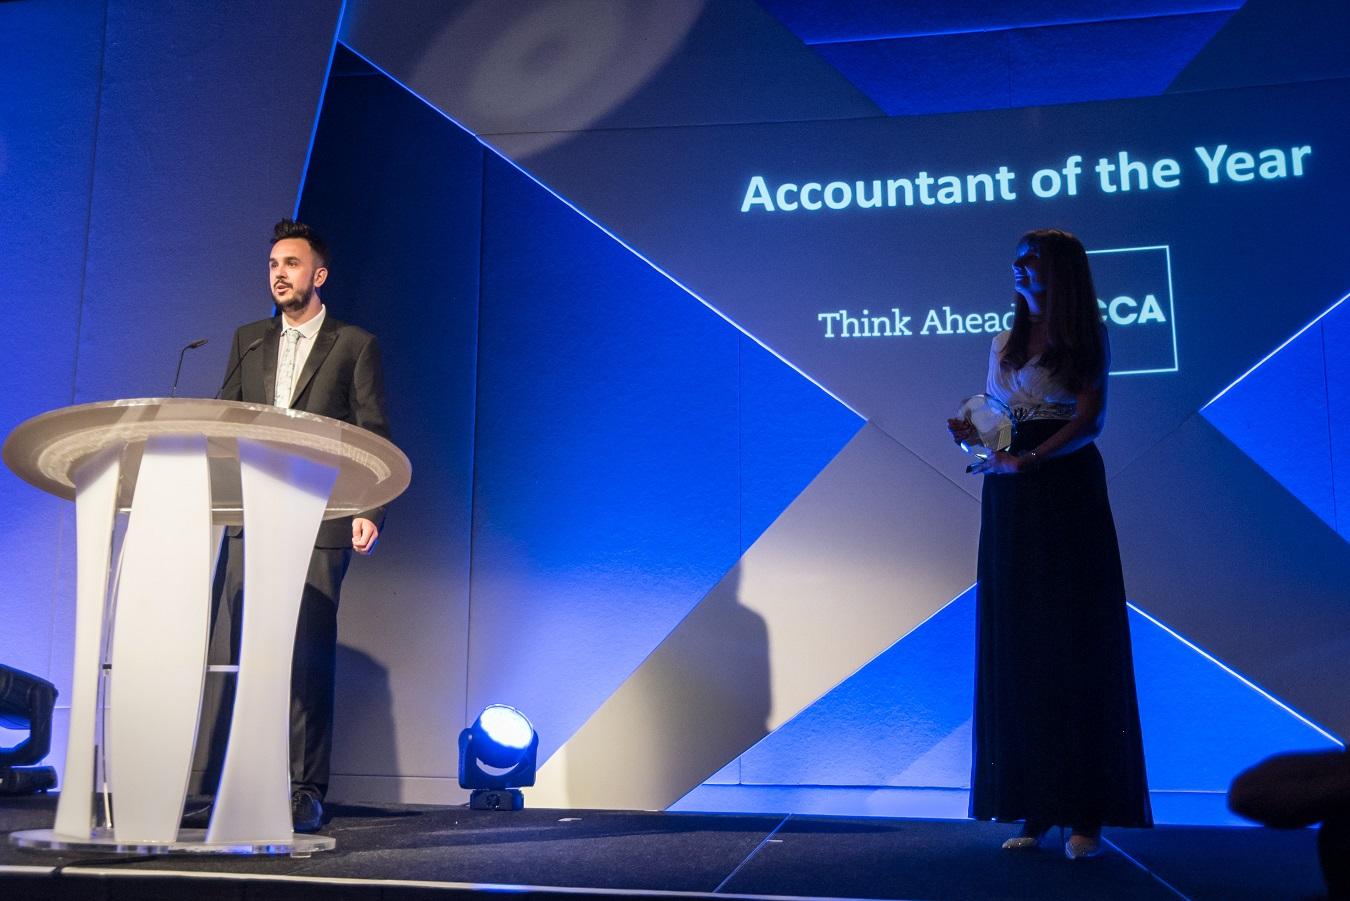 Winner! Accountant of the Year